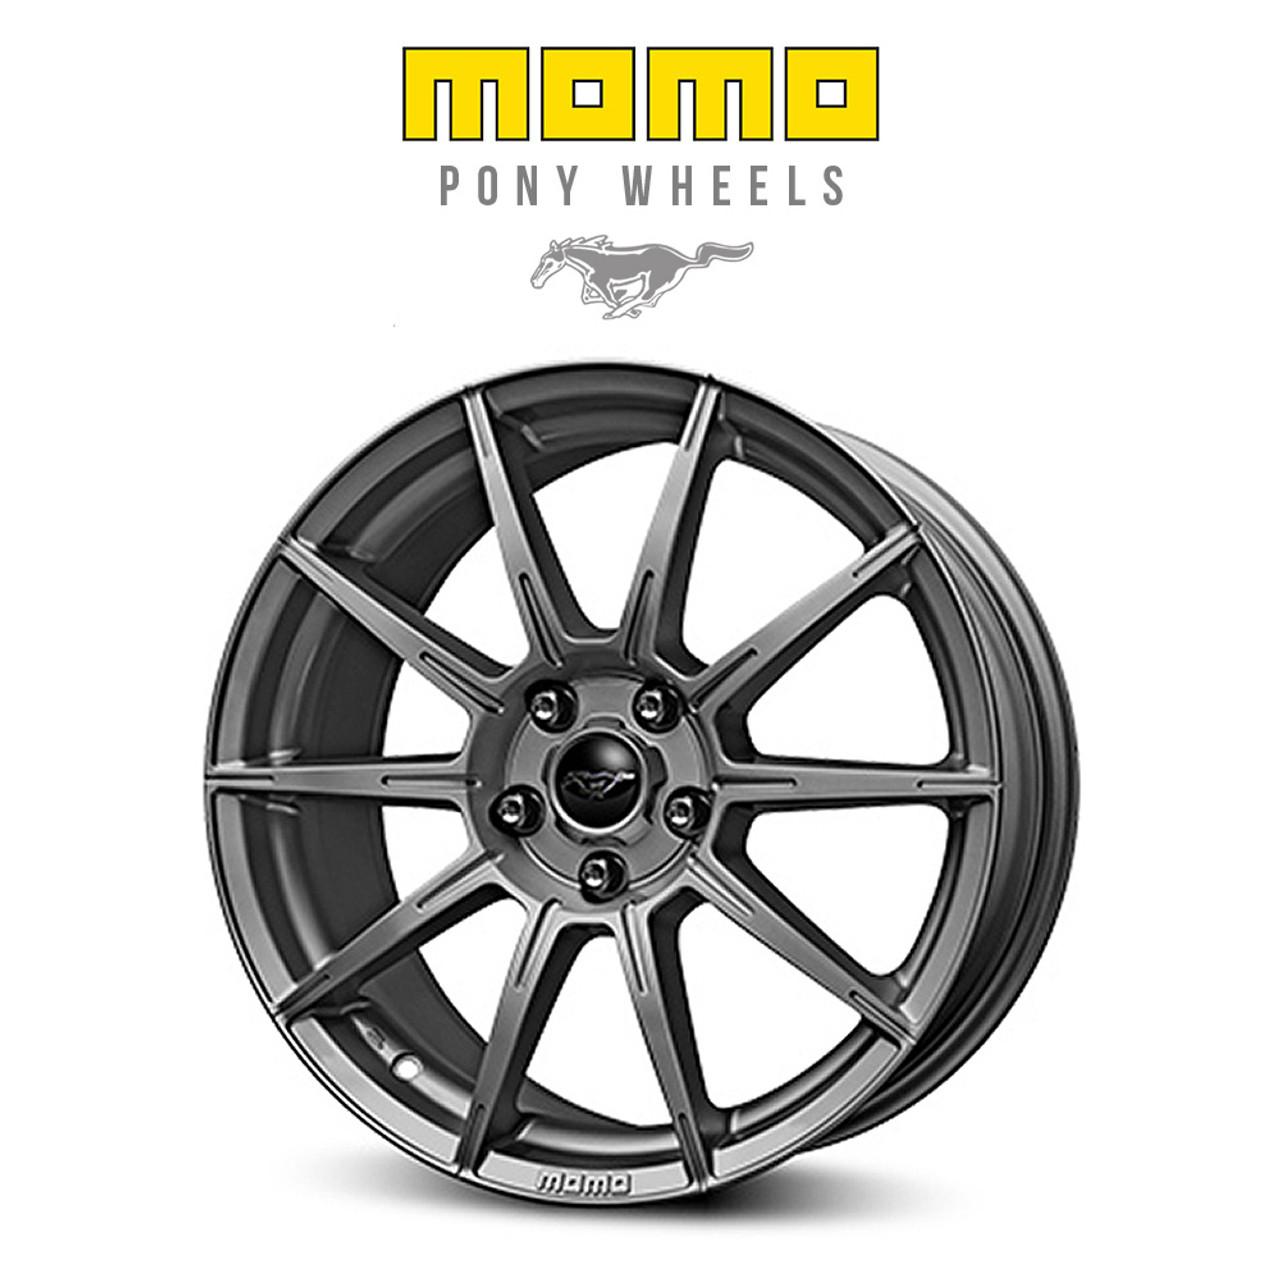 2015-2017 Mustang Herrod MOMO Pony Wheels